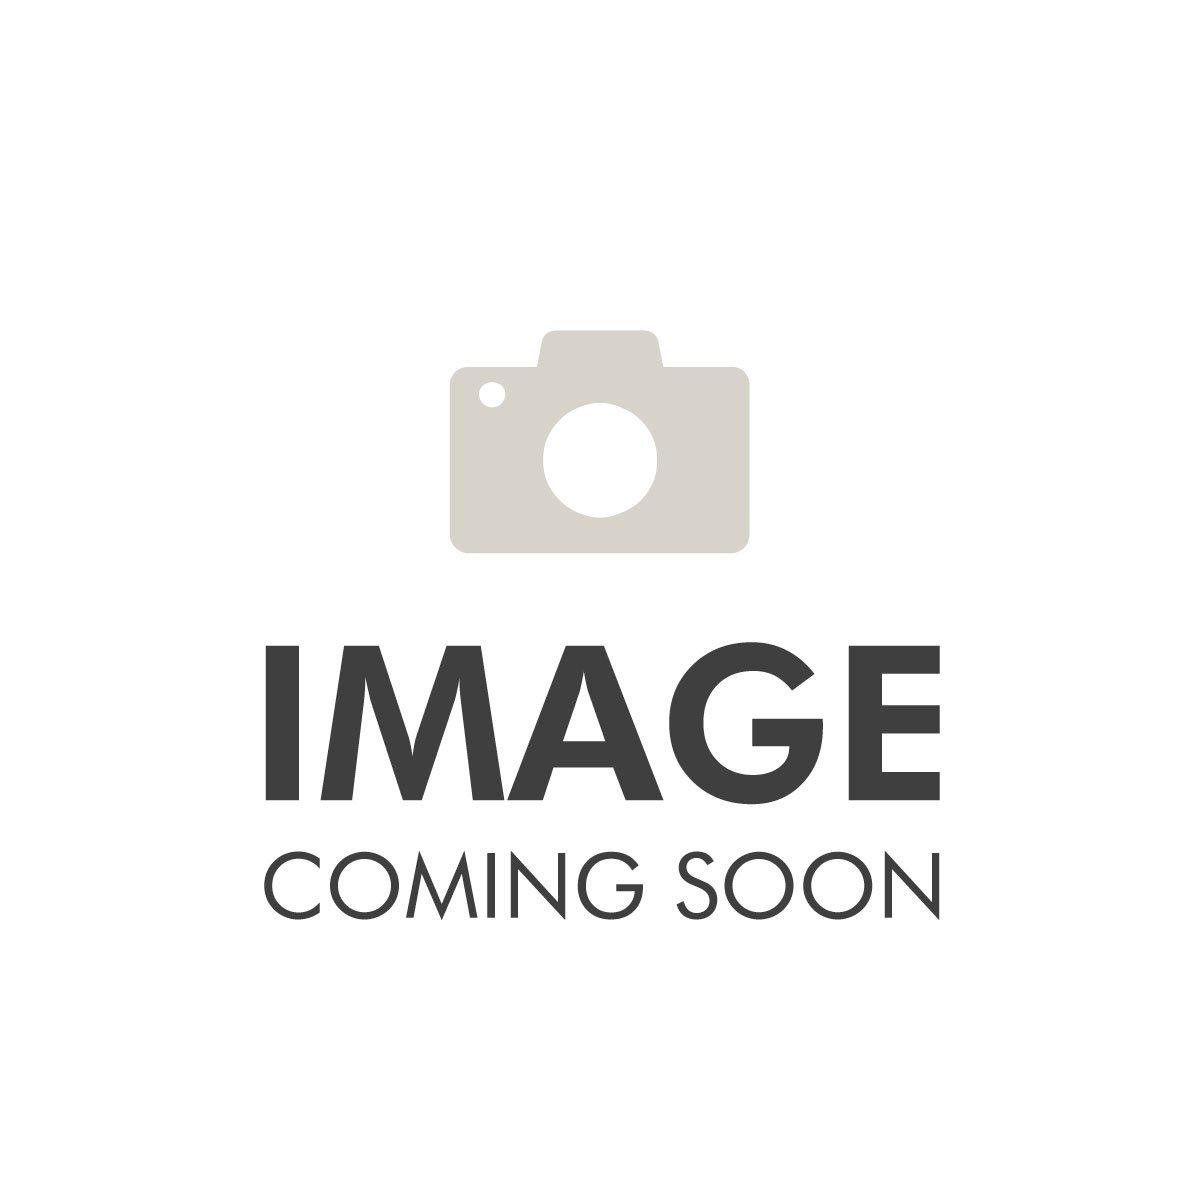 L'Oreal Loreal Color Riche Quads Eyeshadow E3 Infiniment Bronze